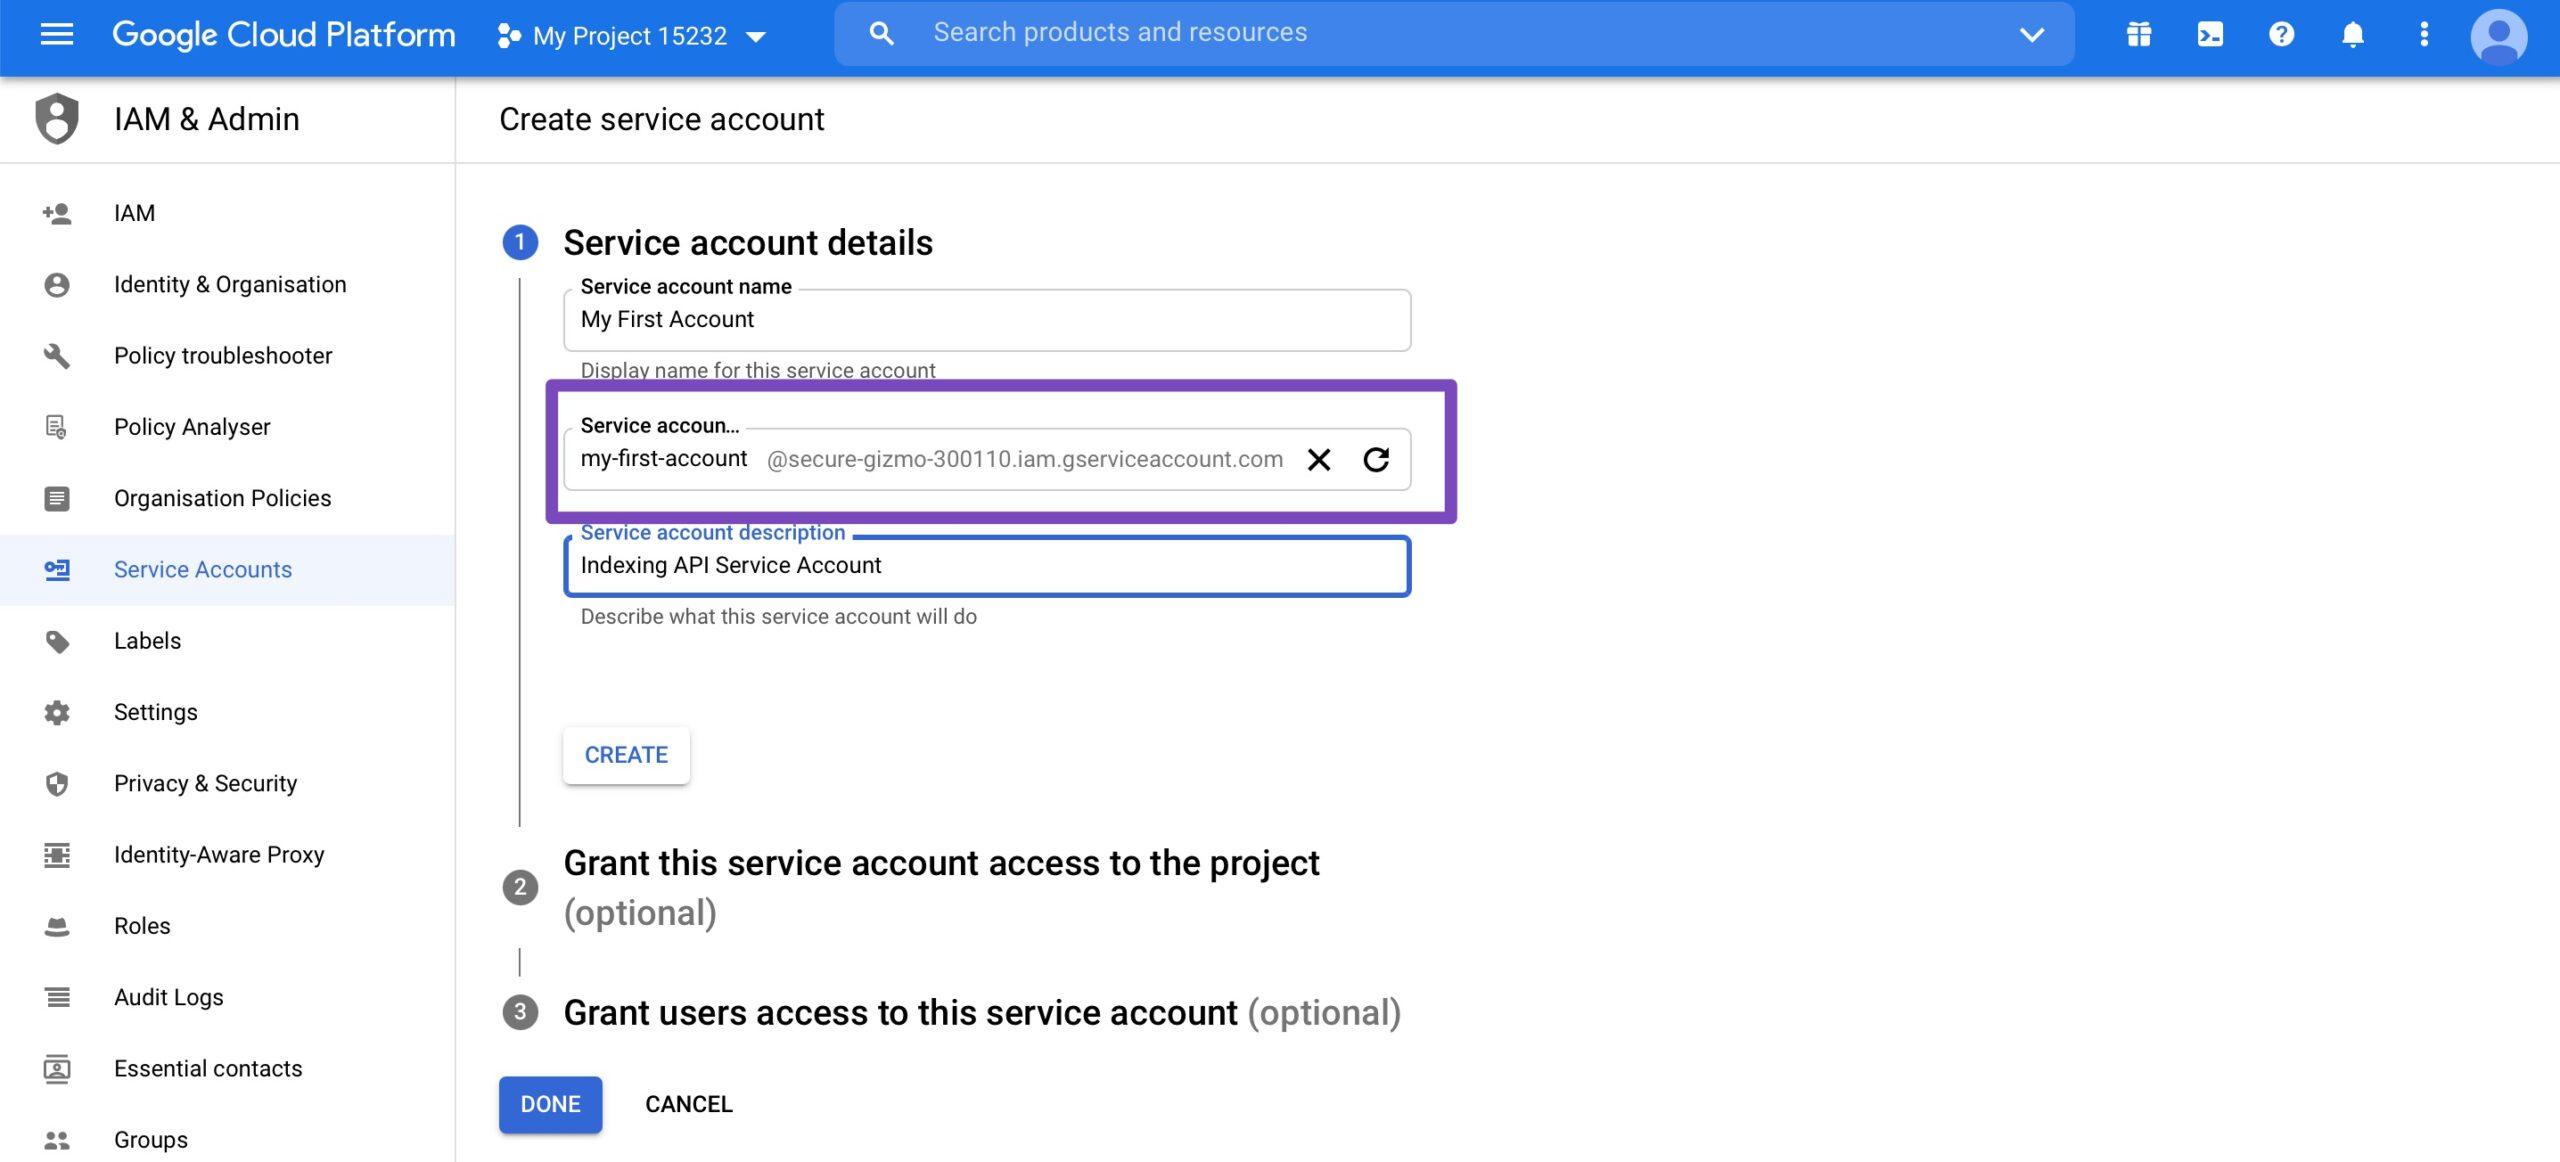 Service Account Details